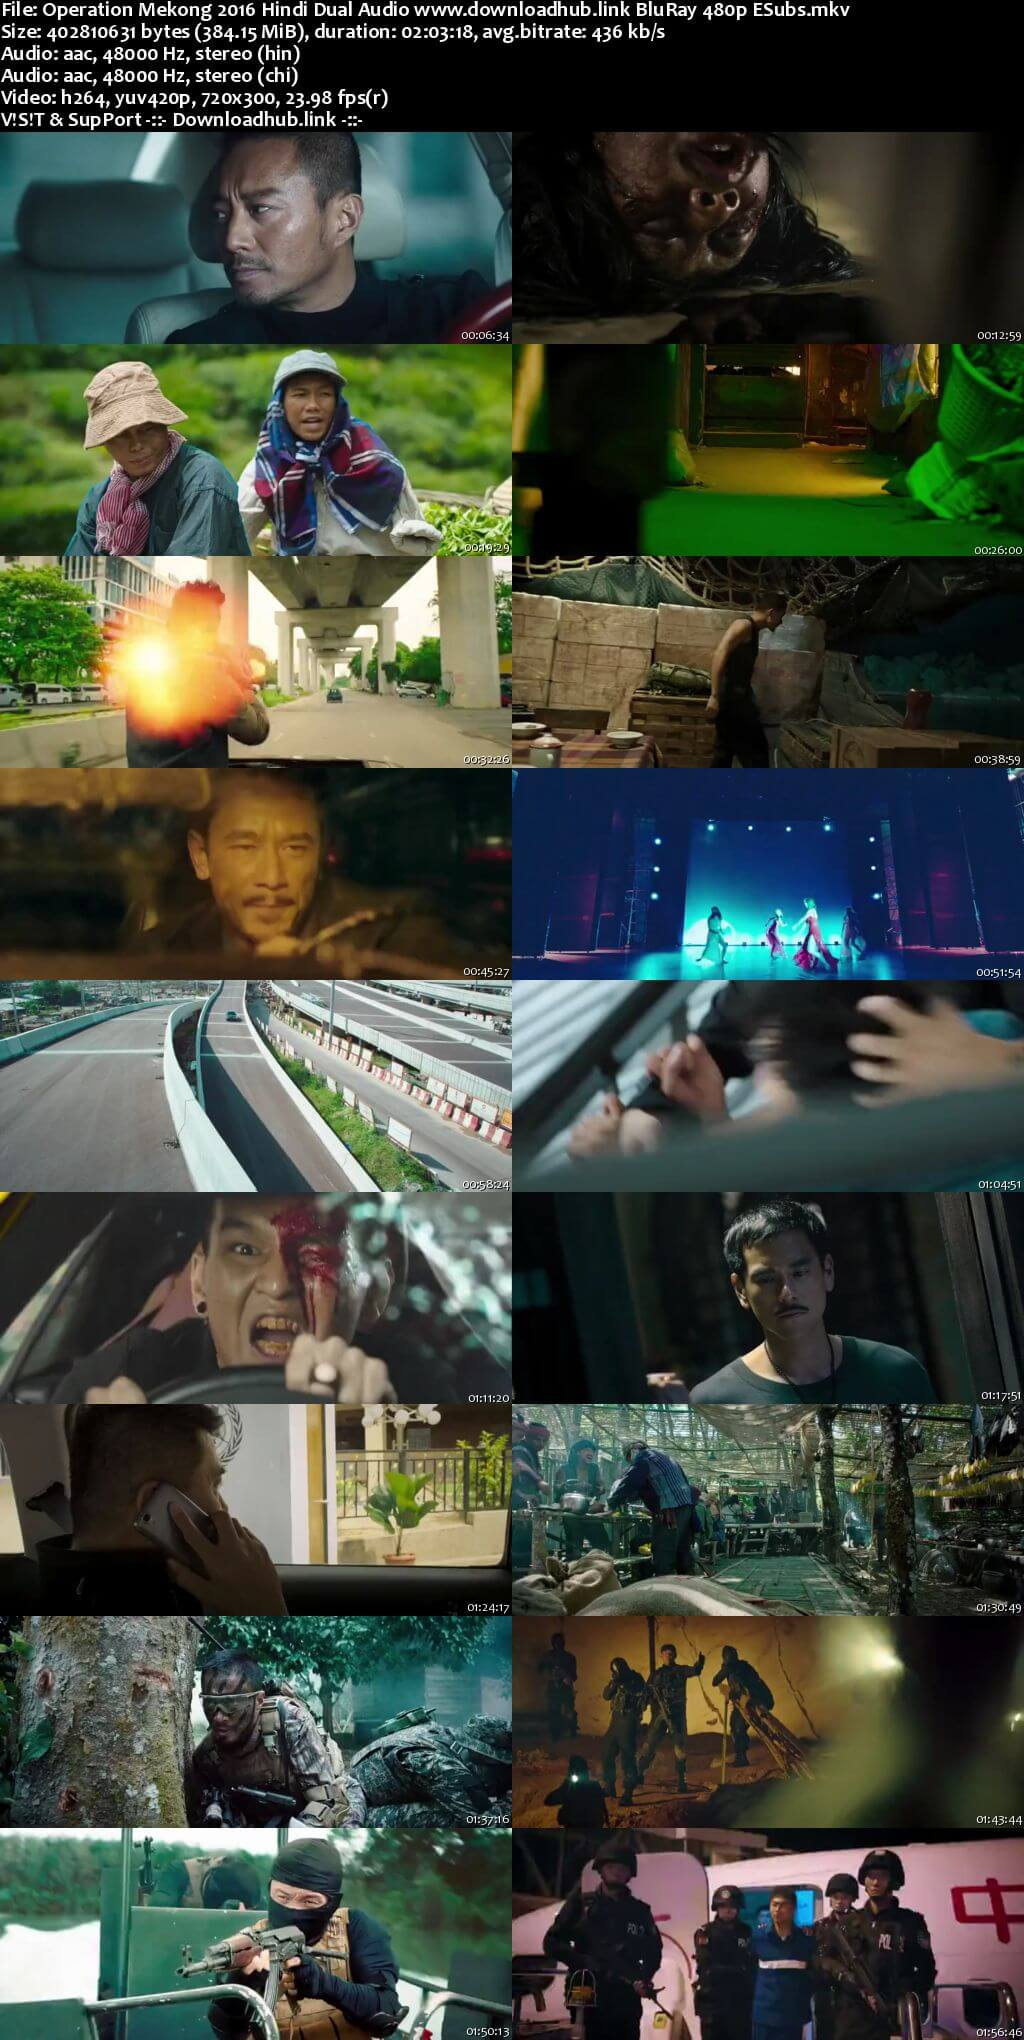 Operation Mekong 2016 Hindi Dual Audio 350MB BluRay 480p ESubs